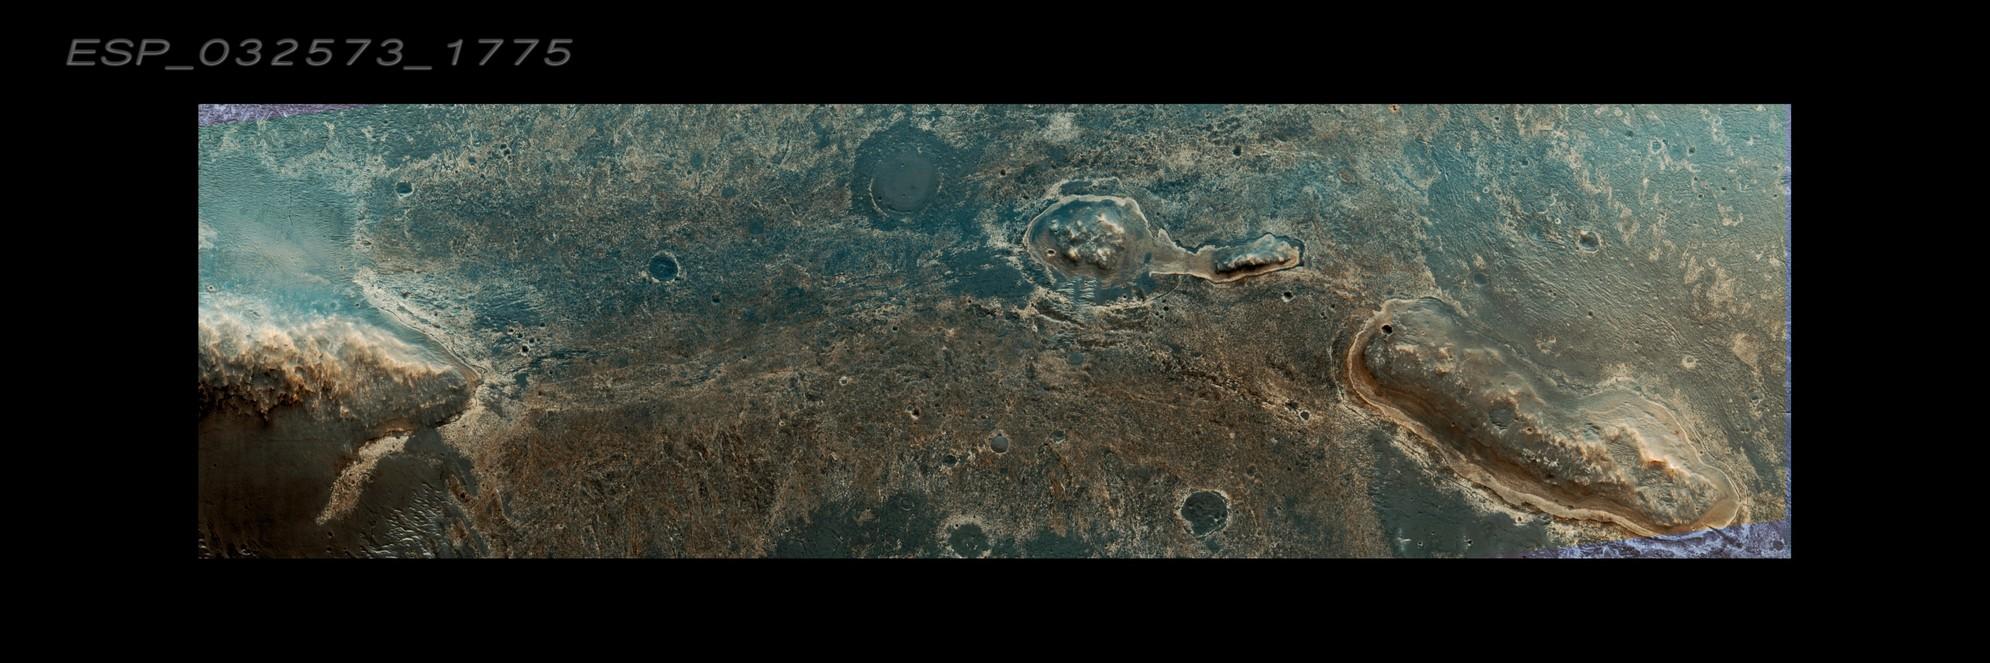 NASA - MRO 'HiRISE' : ESP_032573_1775_RGB